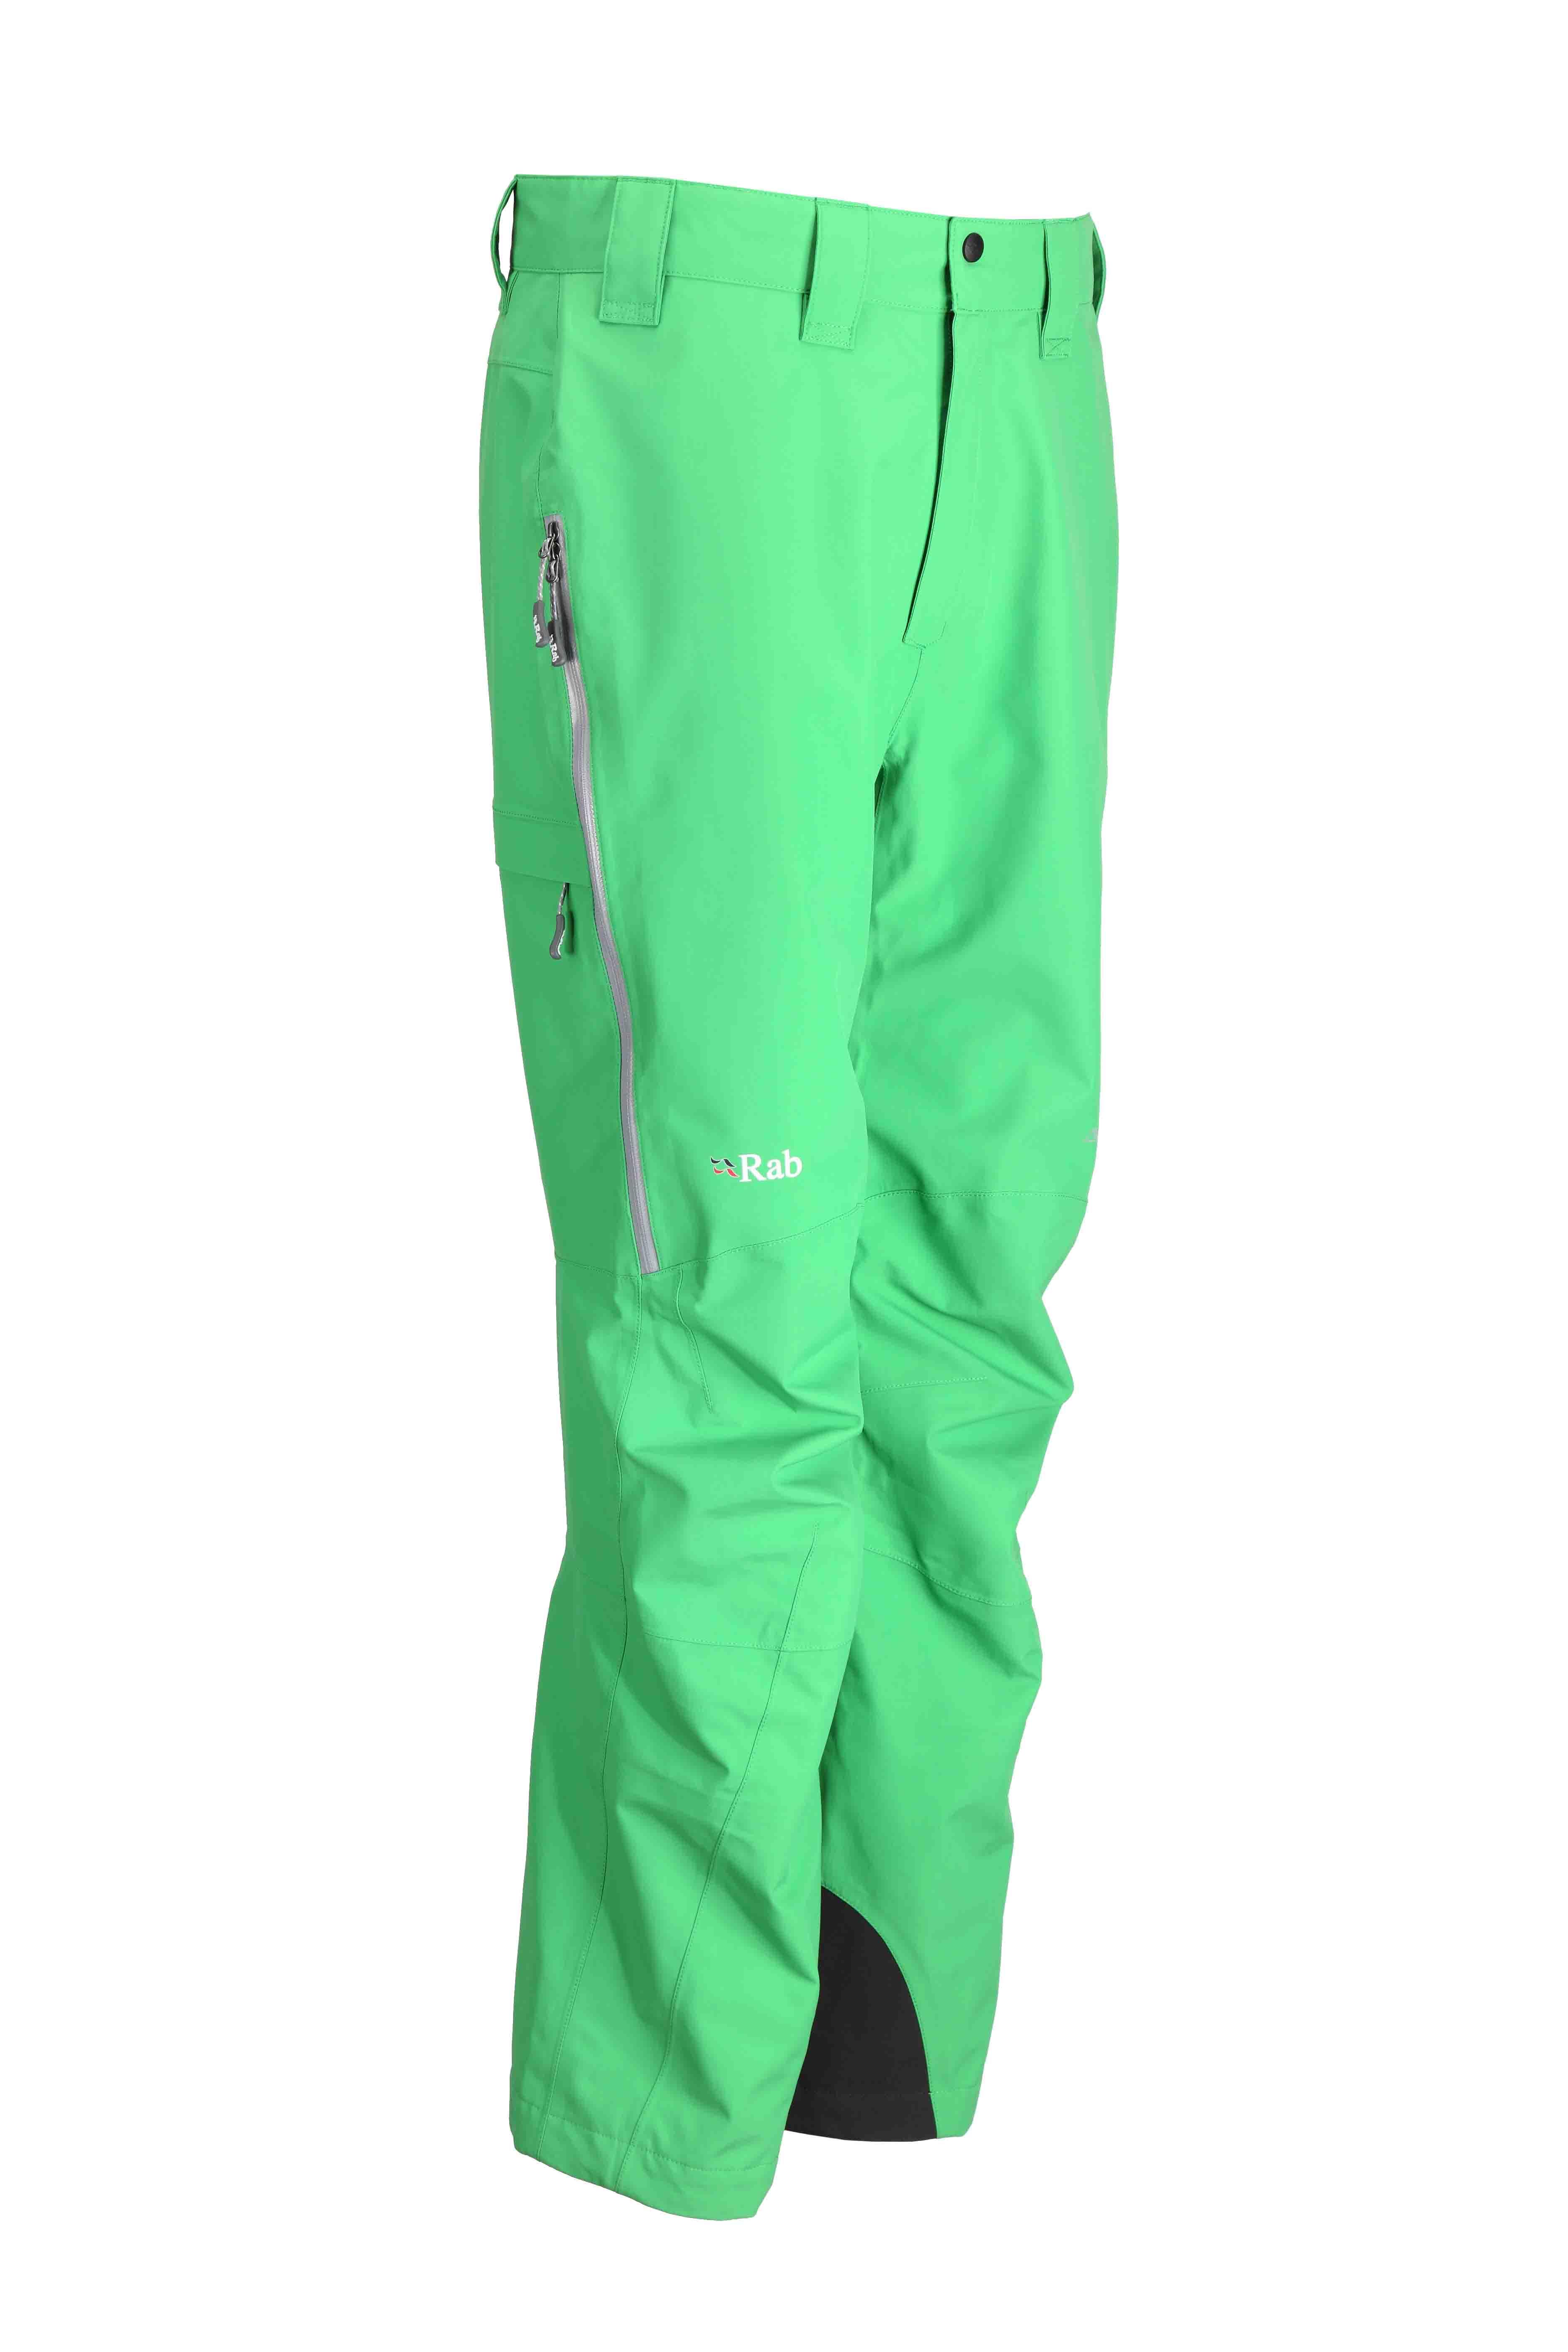 Rab Wasatch Pants with Polartecr NeoShellr